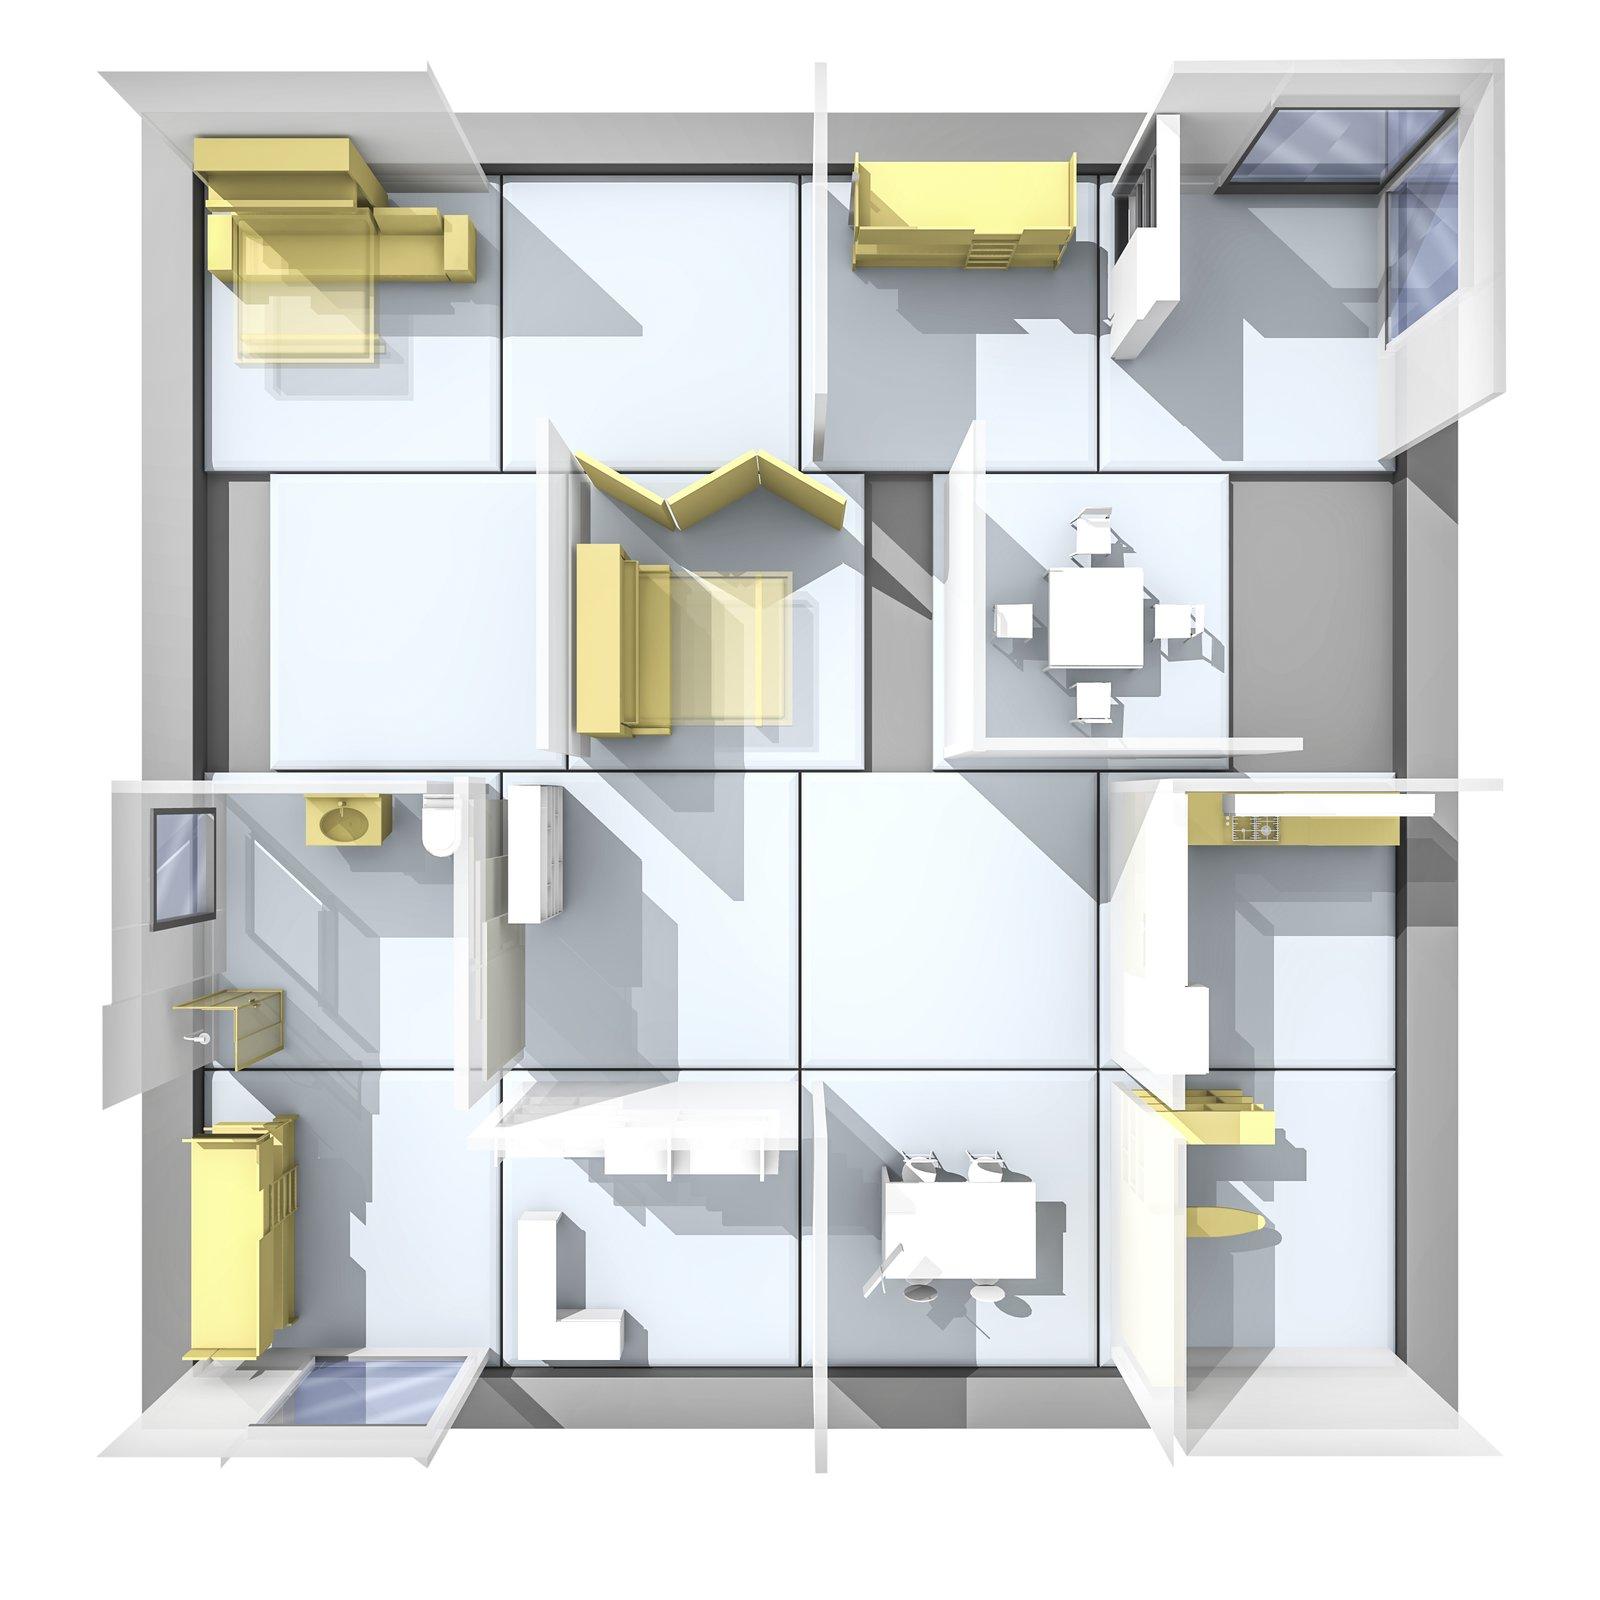 Photo 2 of 5 in An Exhibit Explores Ways to Combat the U.S. Housing ...